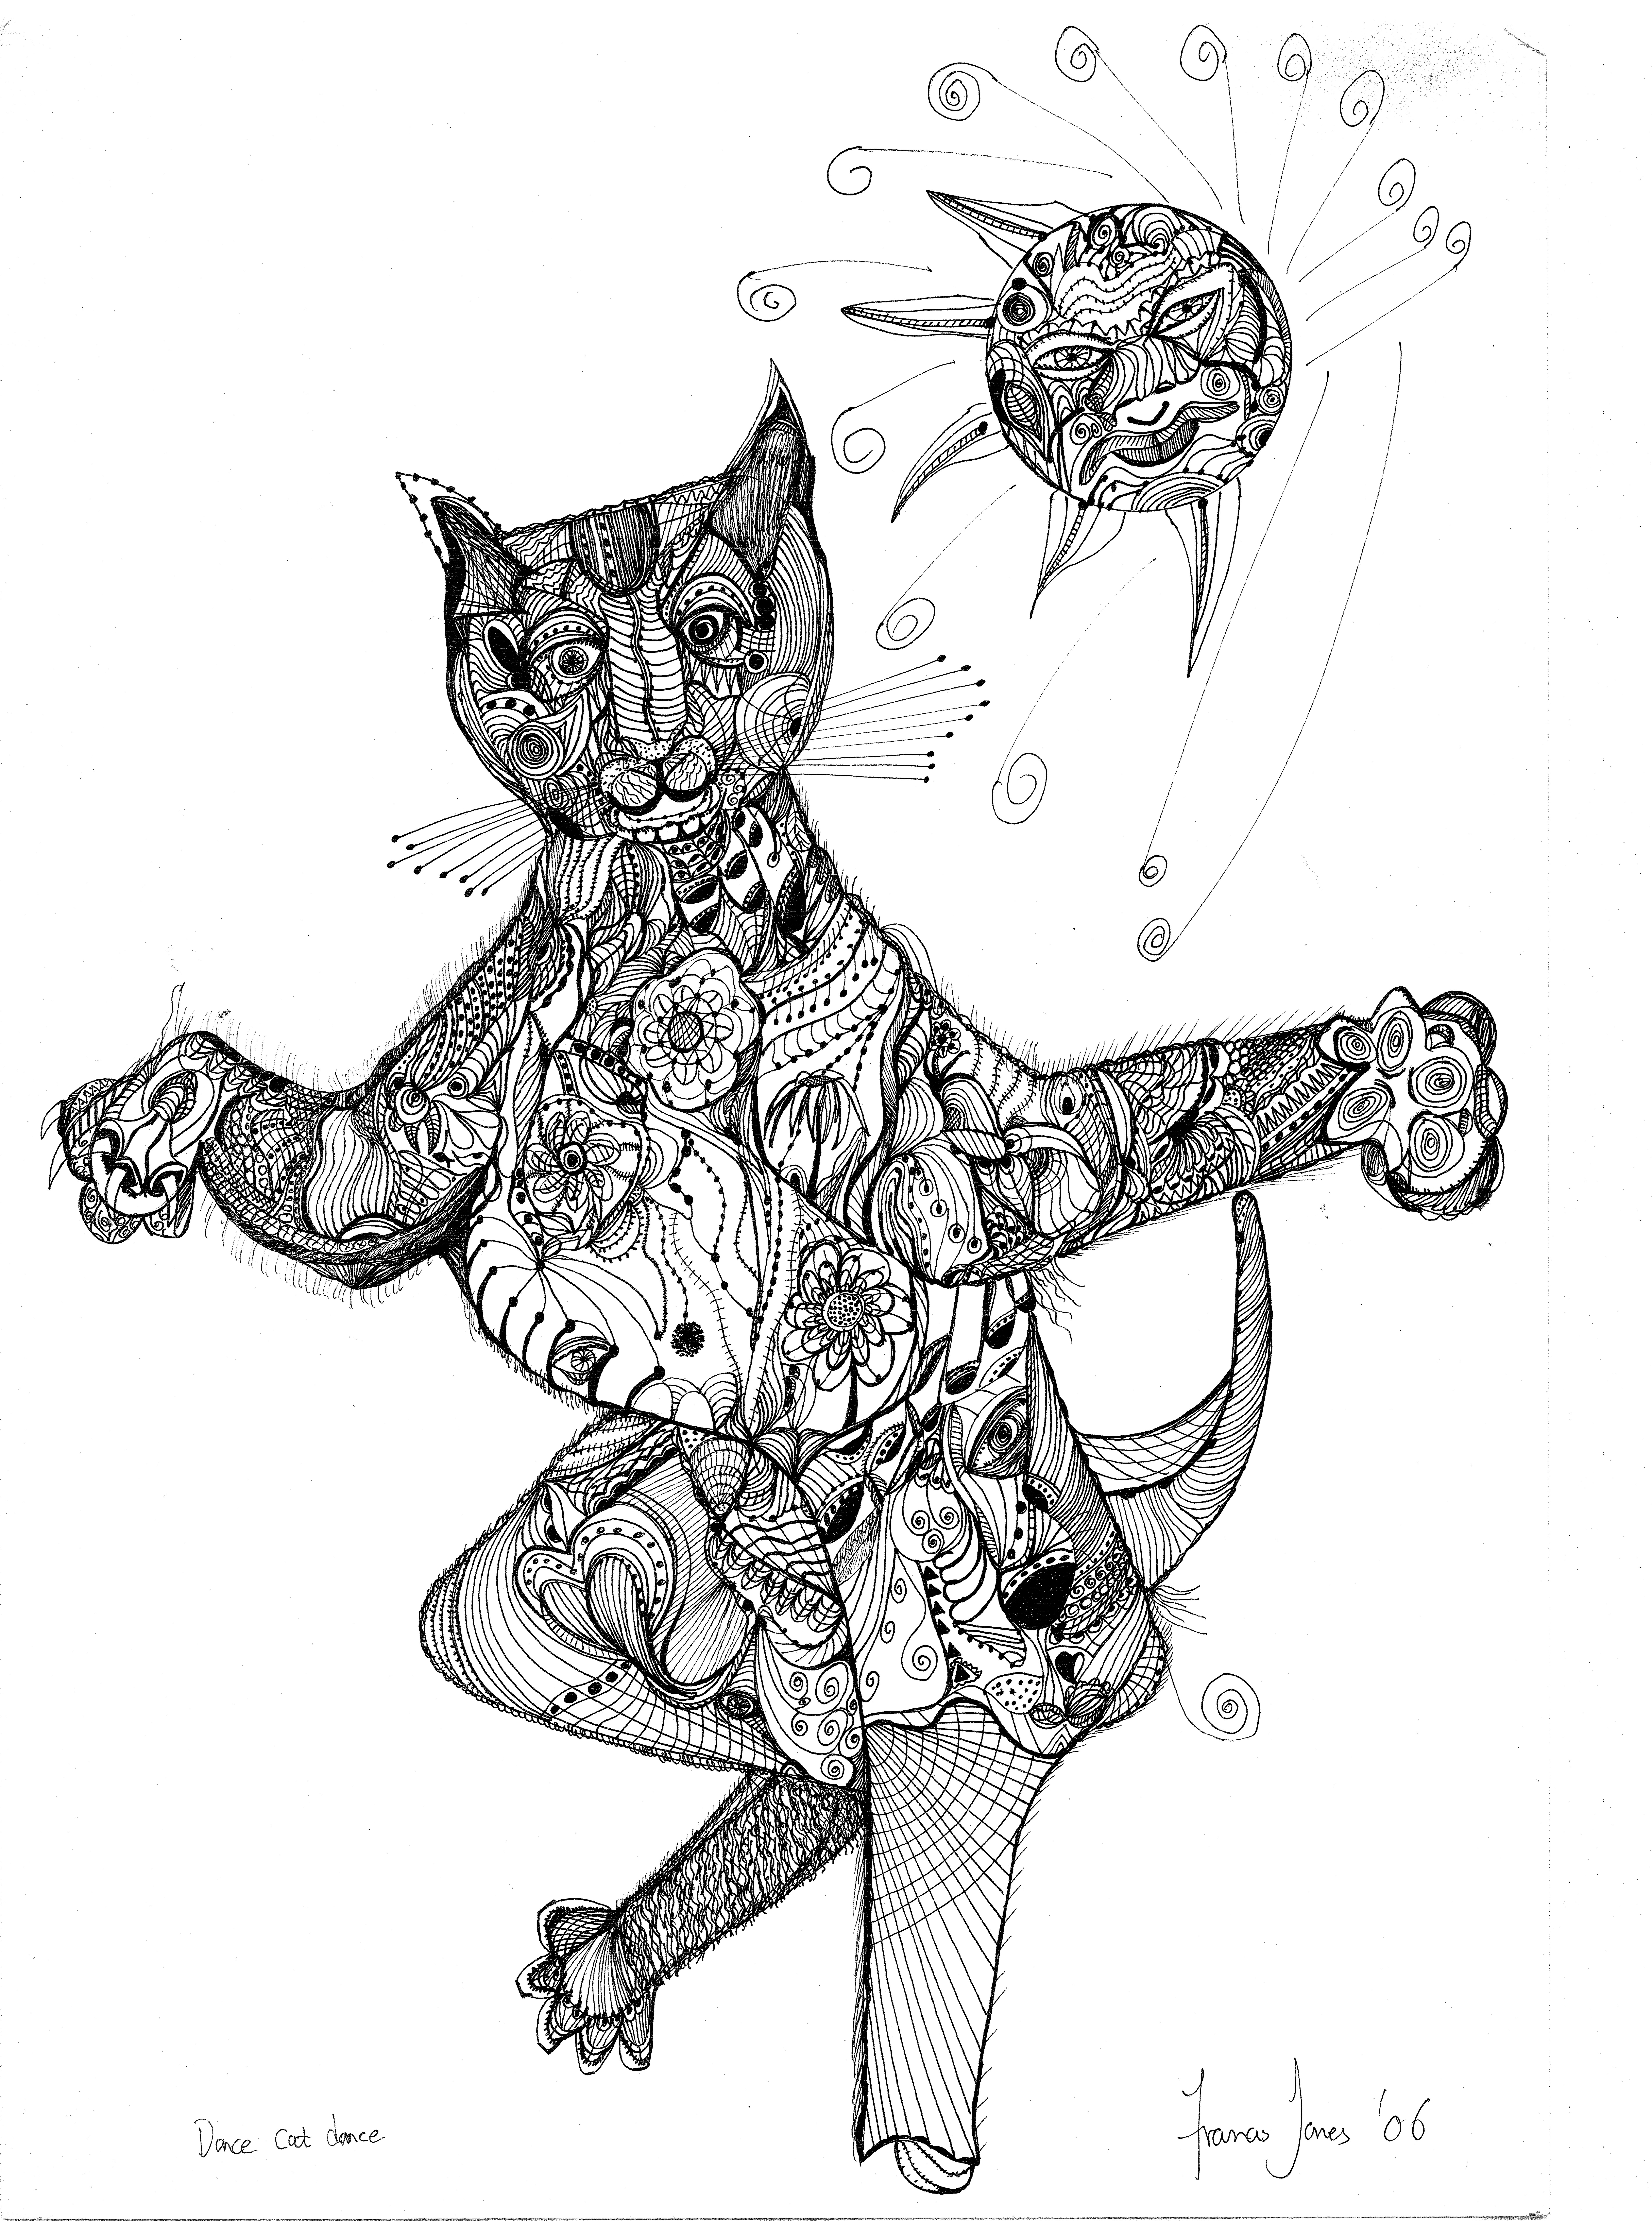 Dance cat dance by Mark Francis-Jones